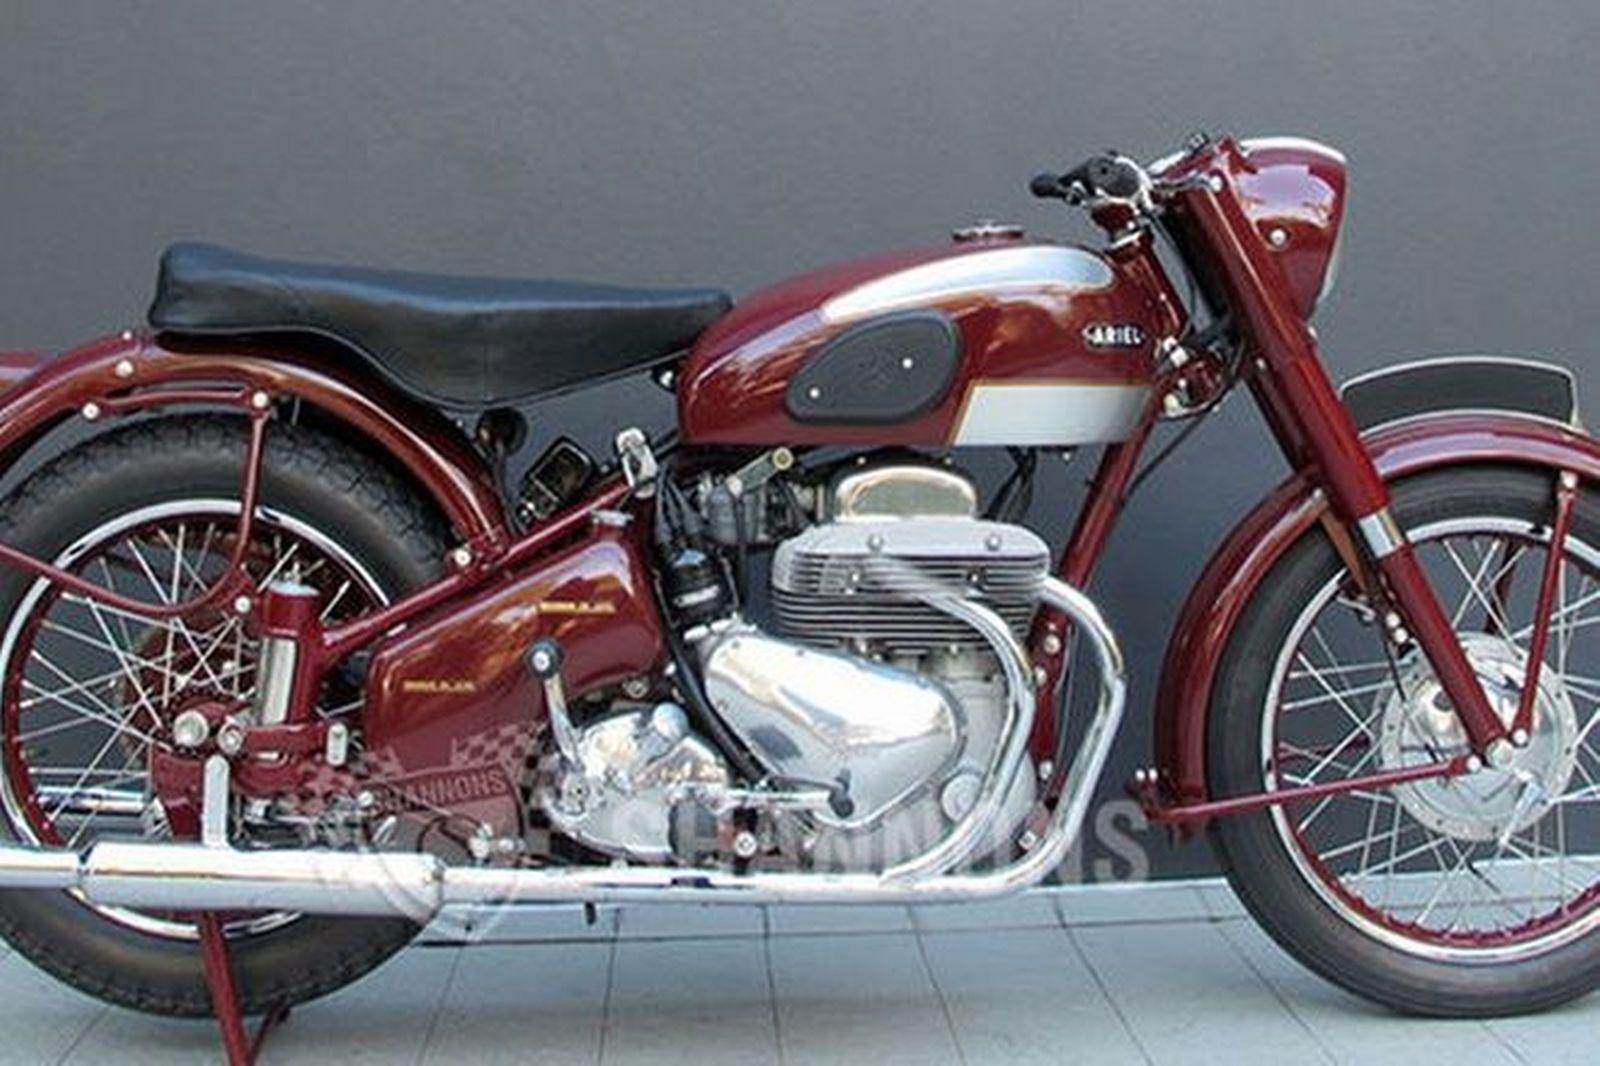 Ariel Square Four Mk Ii 1000cc Motorcycle Auctions Lot Z